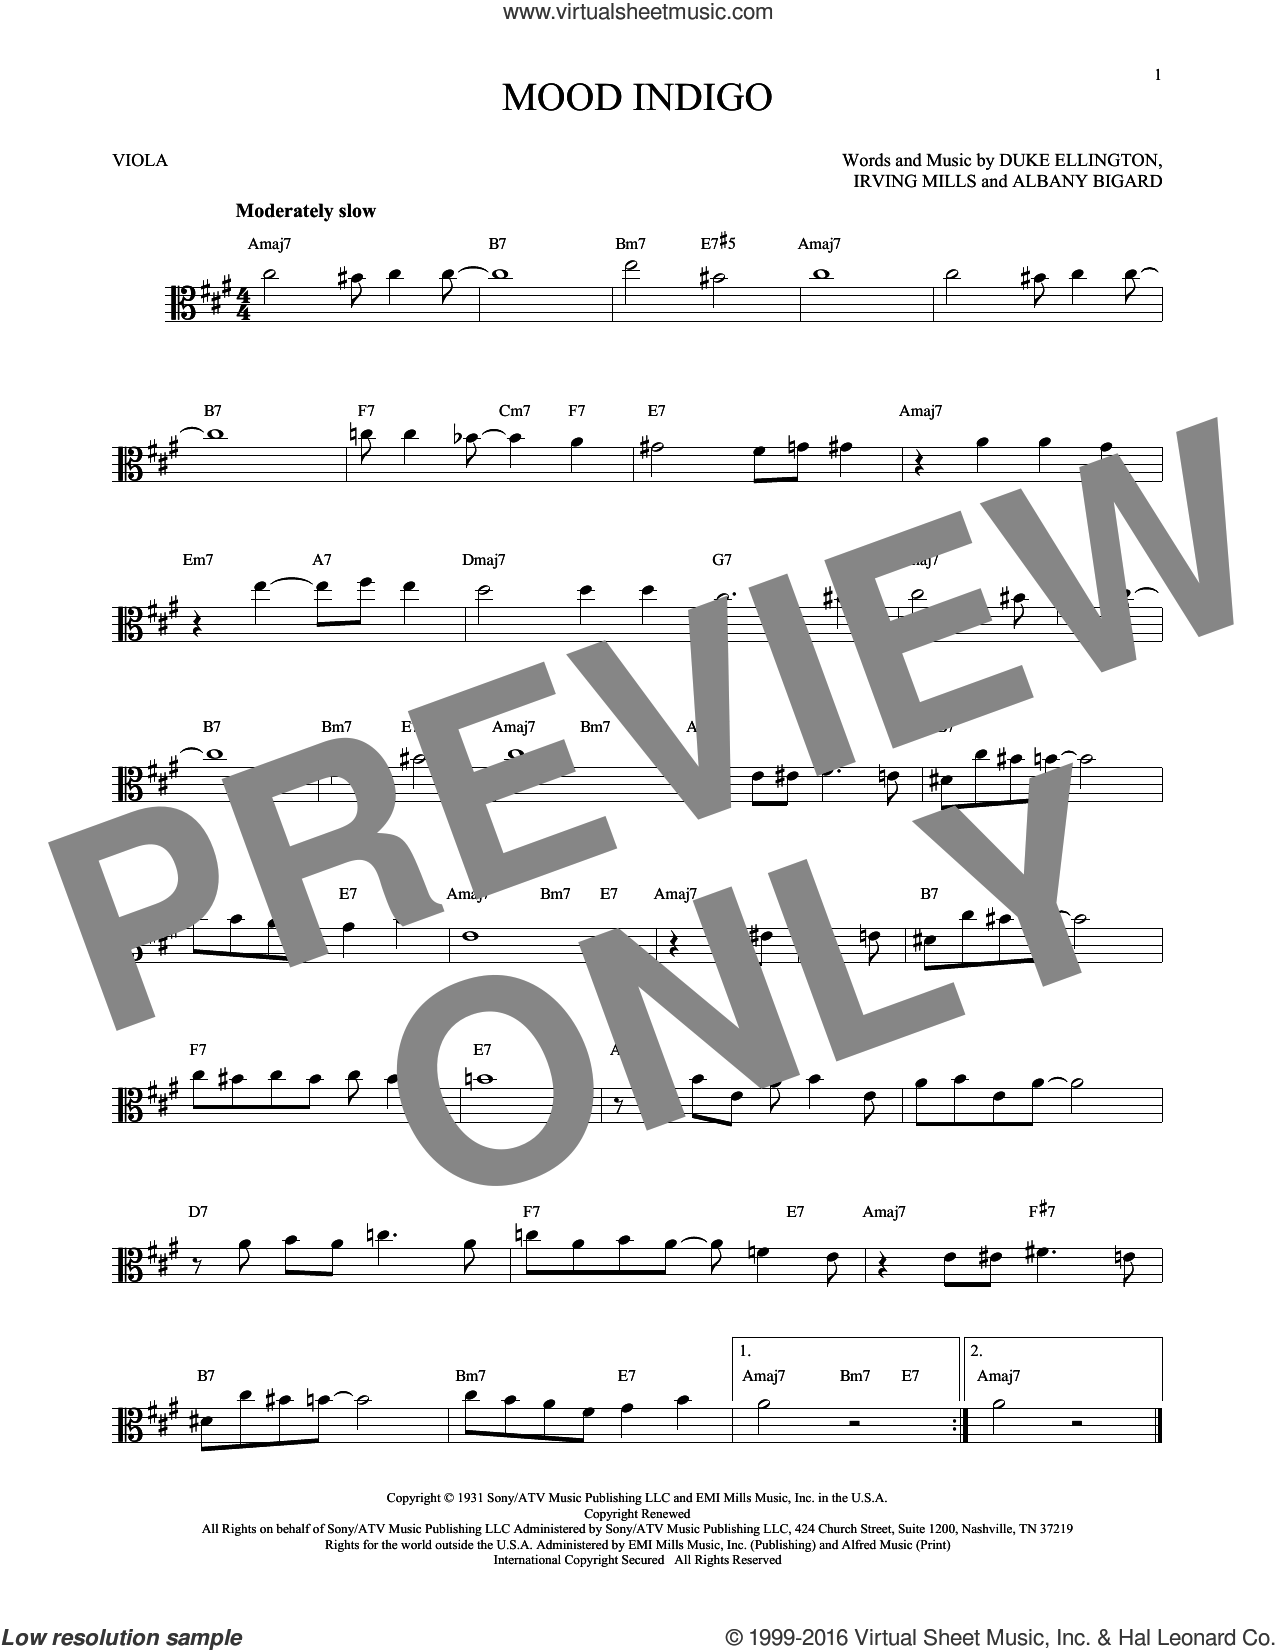 Mood Indigo sheet music for viola solo by Duke Ellington, Albany Bigard and Irving Mills, intermediate skill level